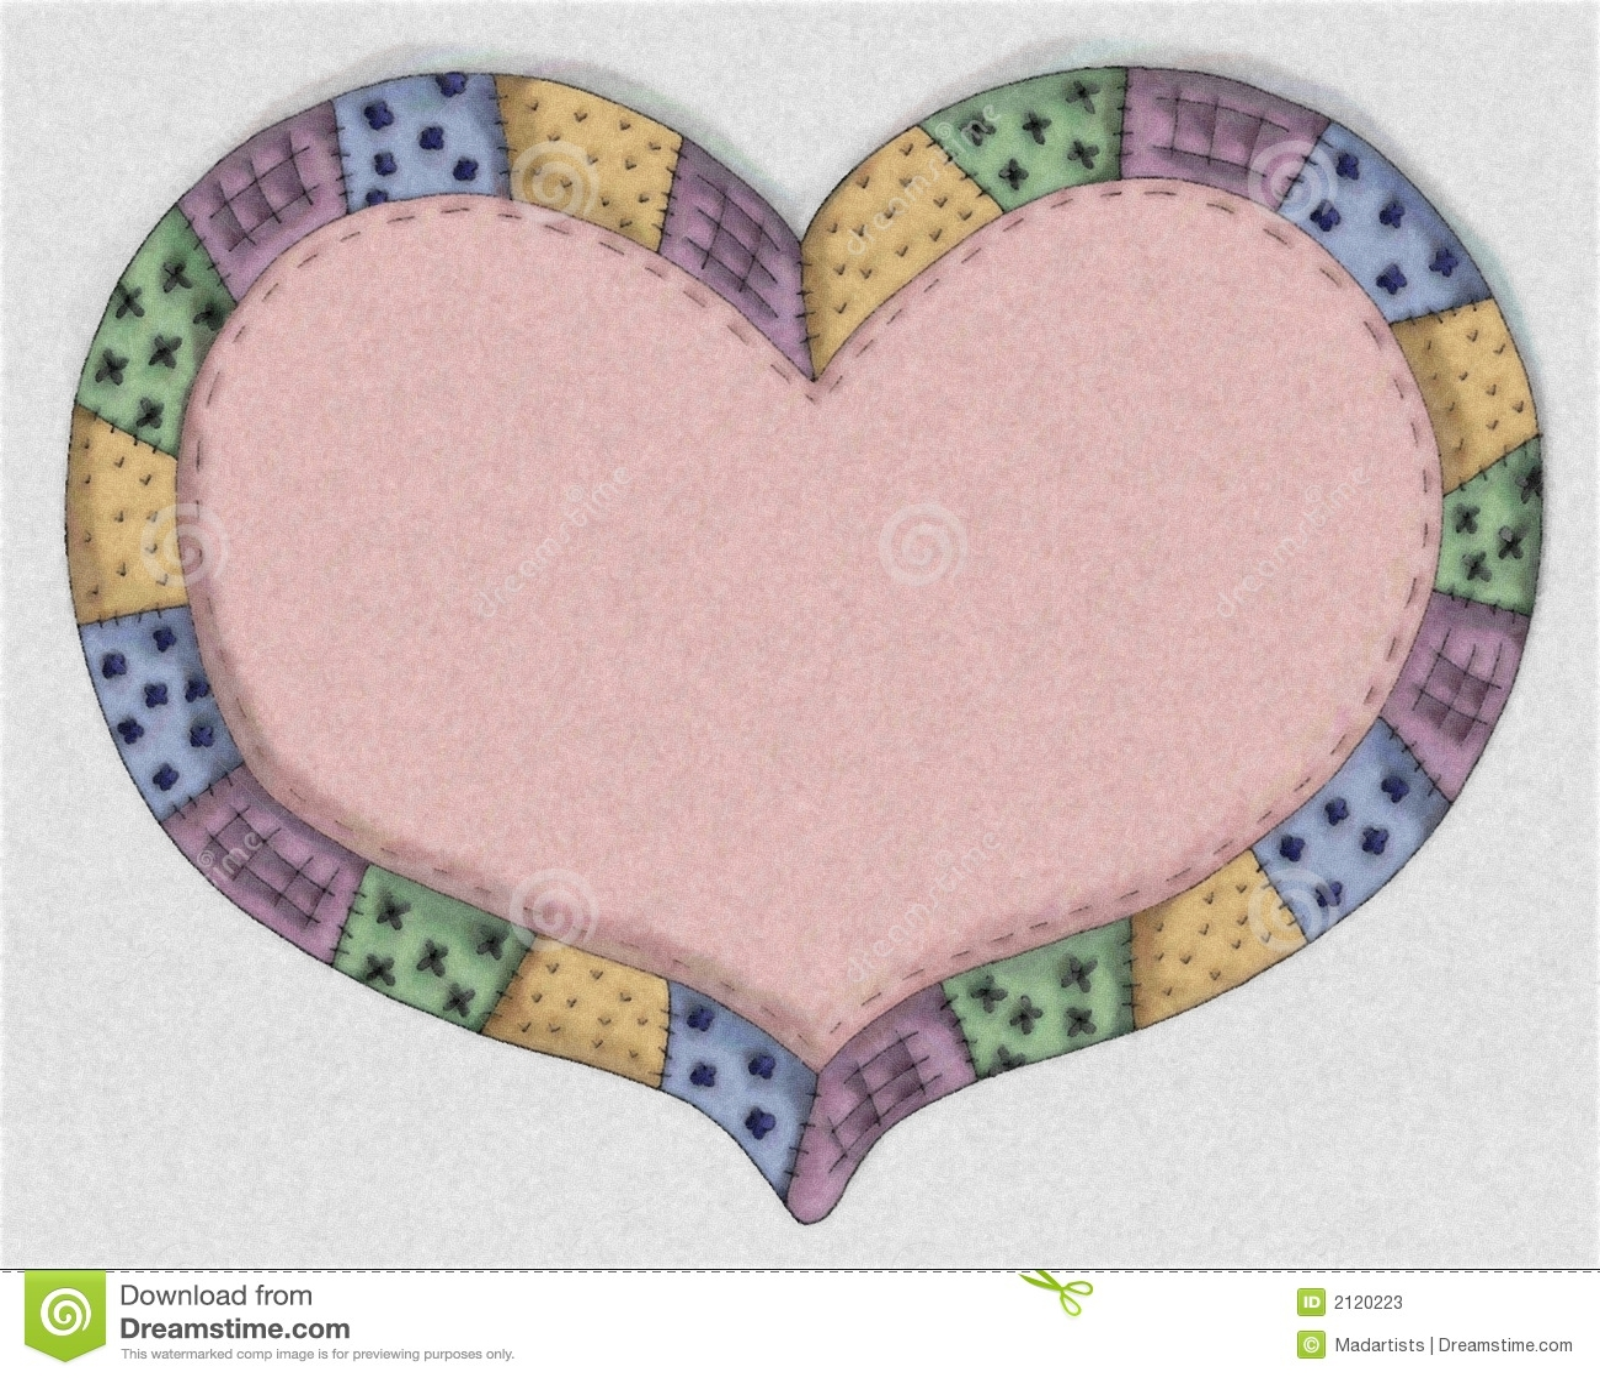 Quilt Border Clipart Hand drawn pink \x3cb\x3equilt\x3c/b\x3e heart ...